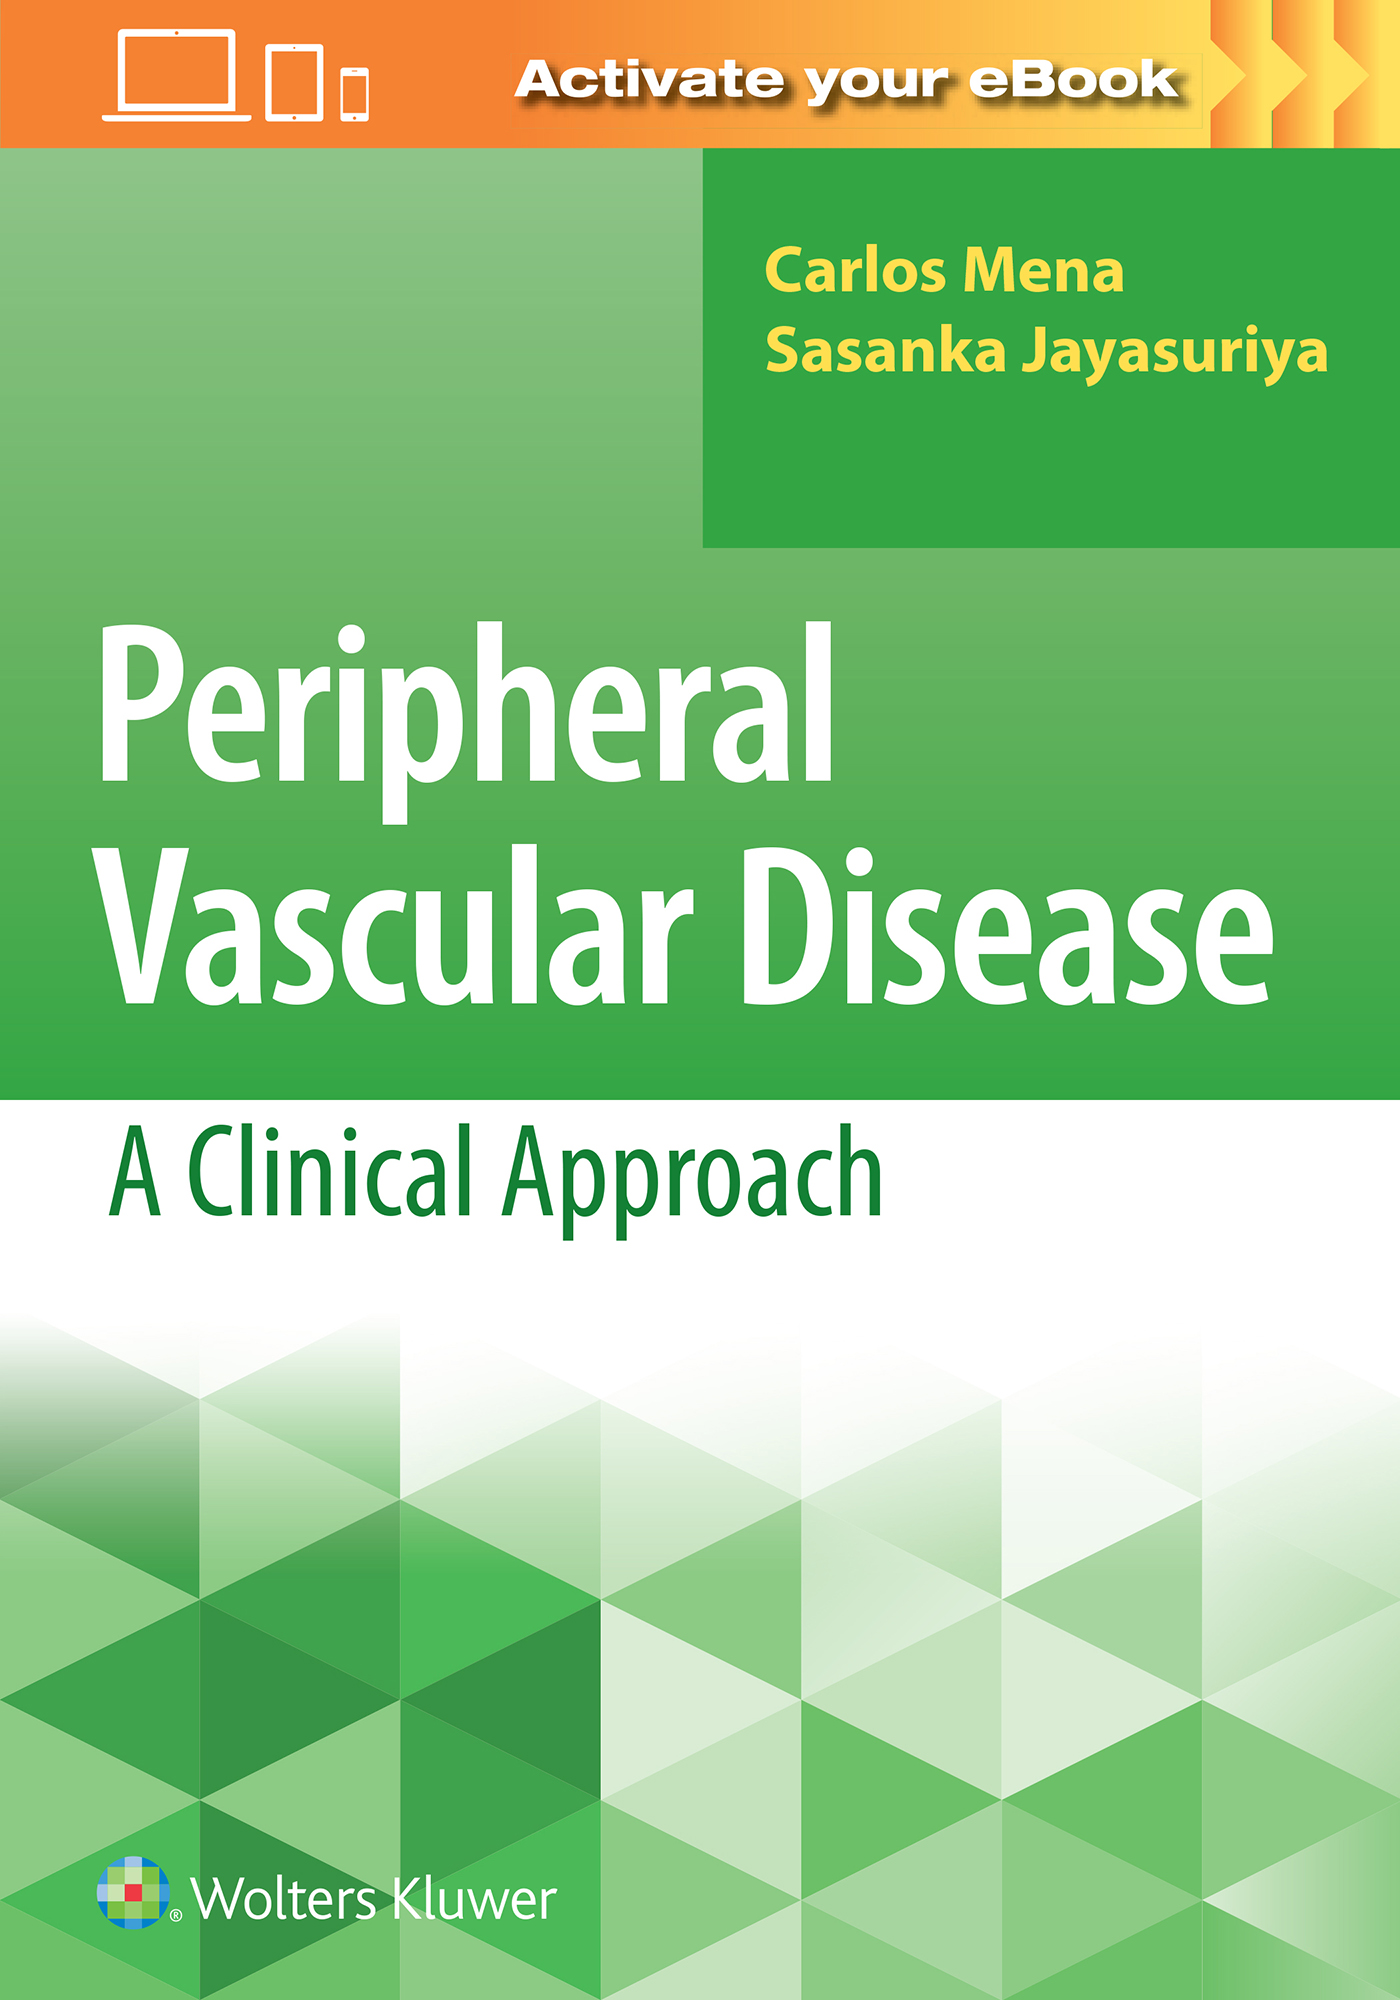 Peripheral Vascular Disease: A Clinical Approach